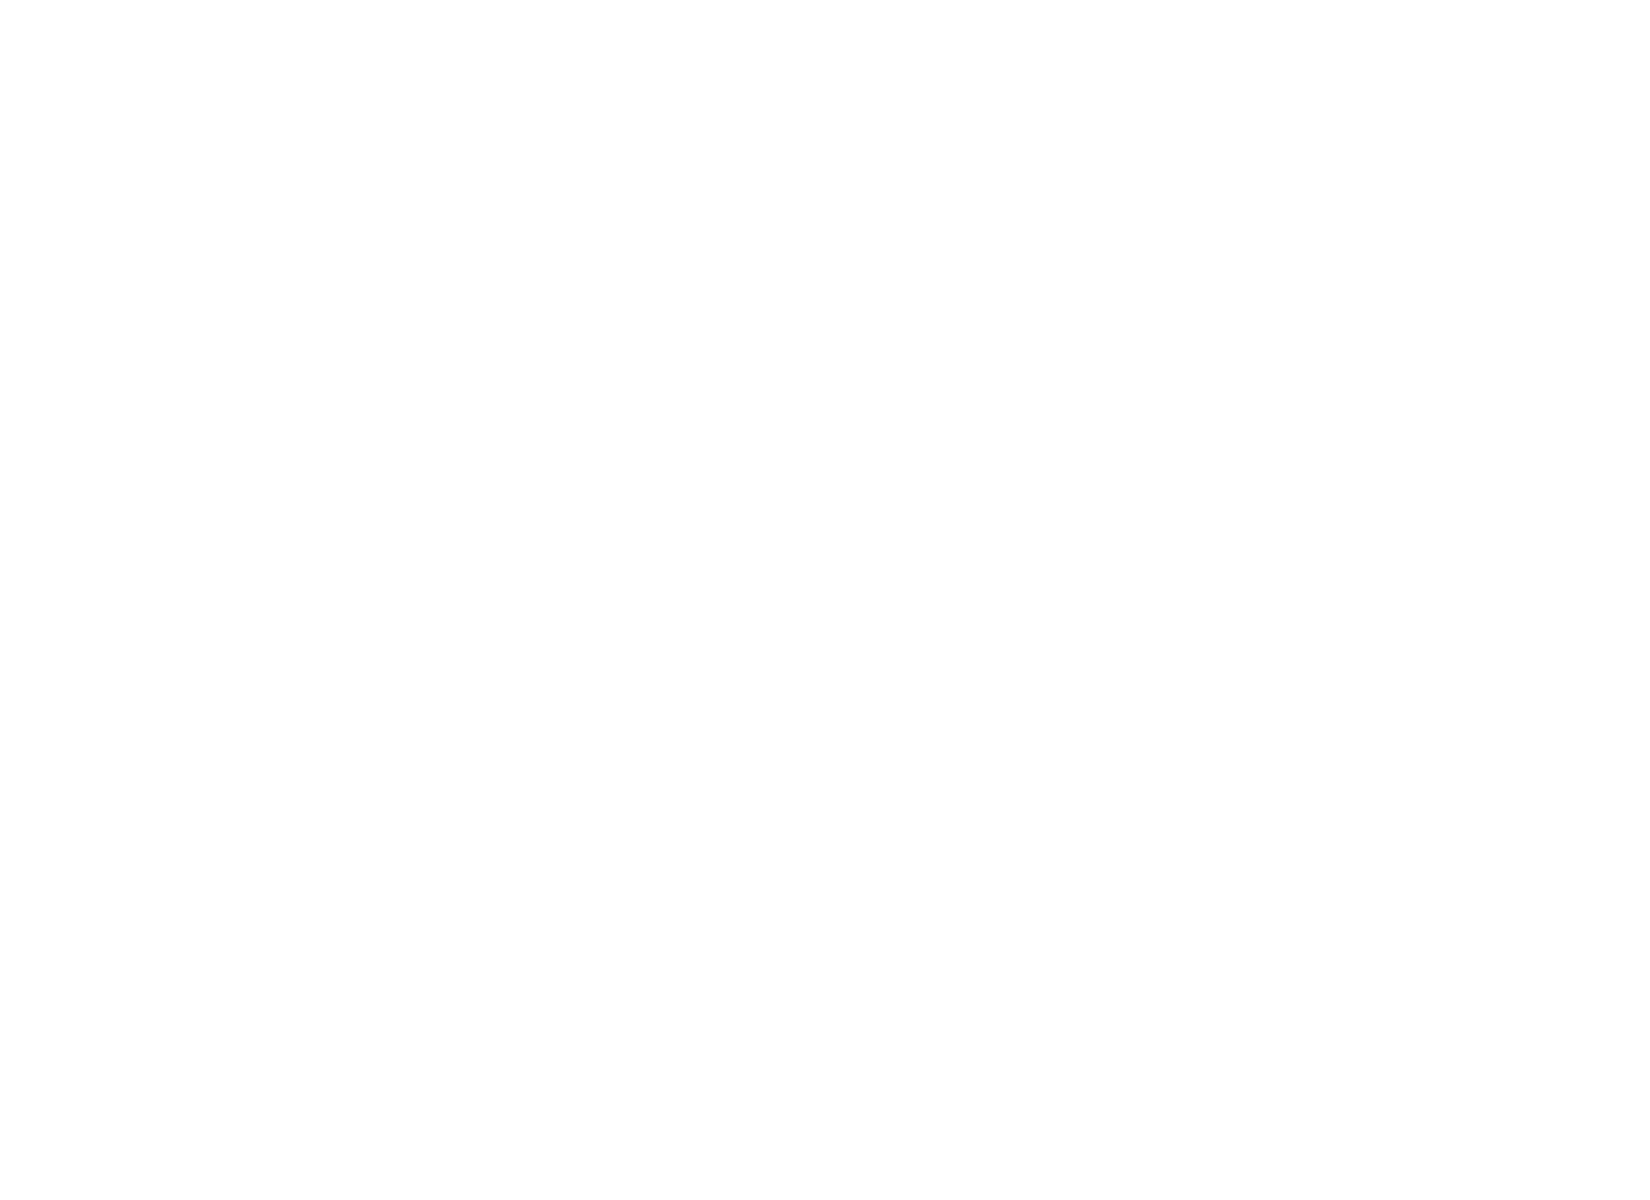 JYWT_logo_white-01.png